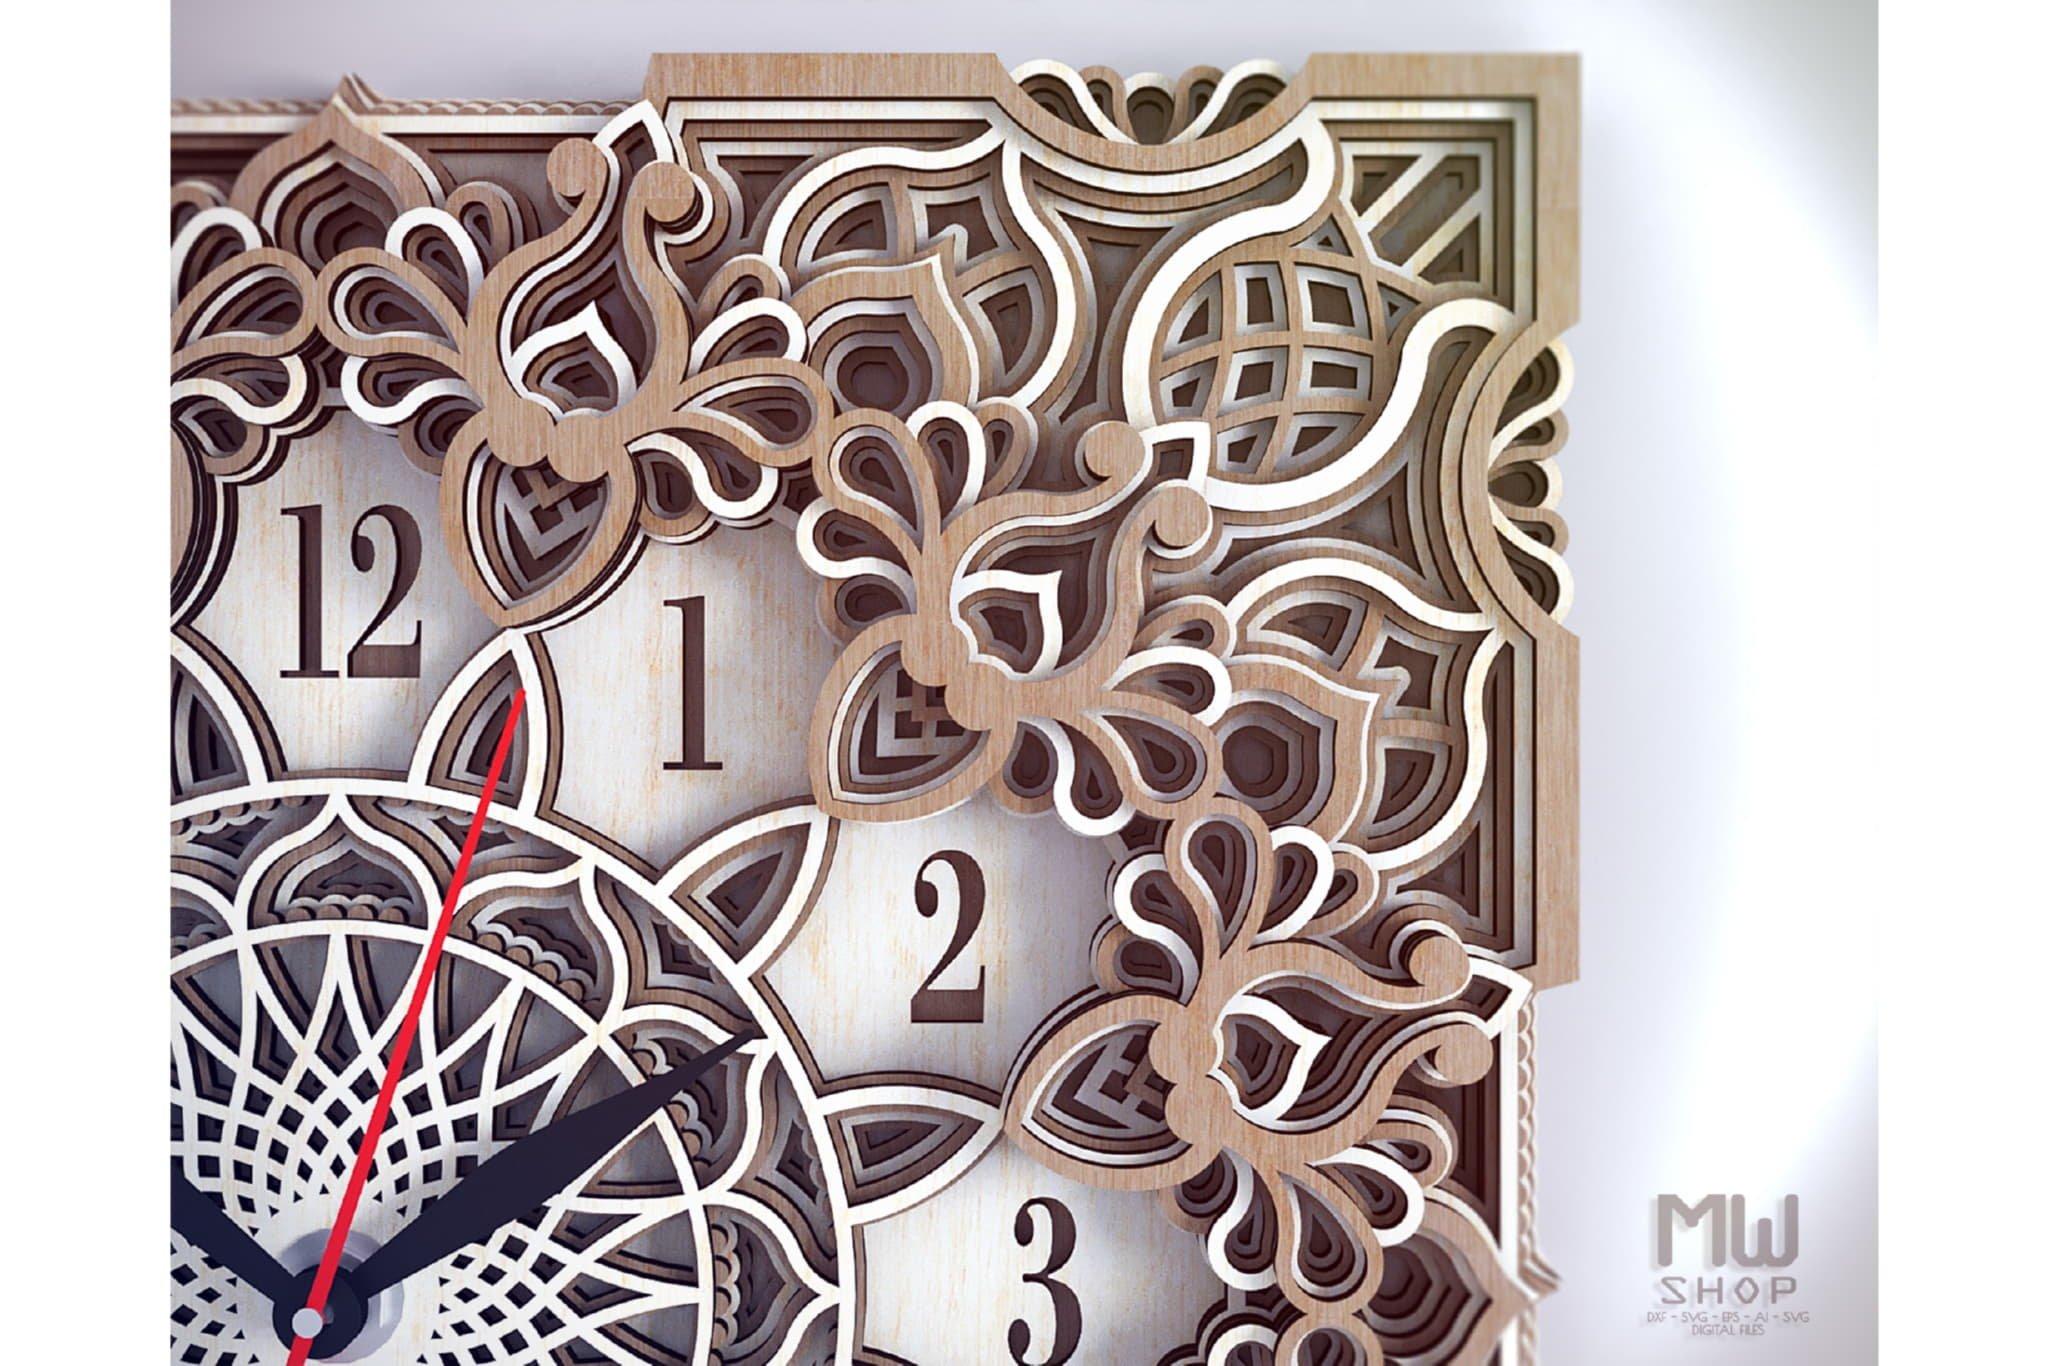 C13 - Mandala Clock DXF for Laser cut, Sacred Clock SVG example image 7